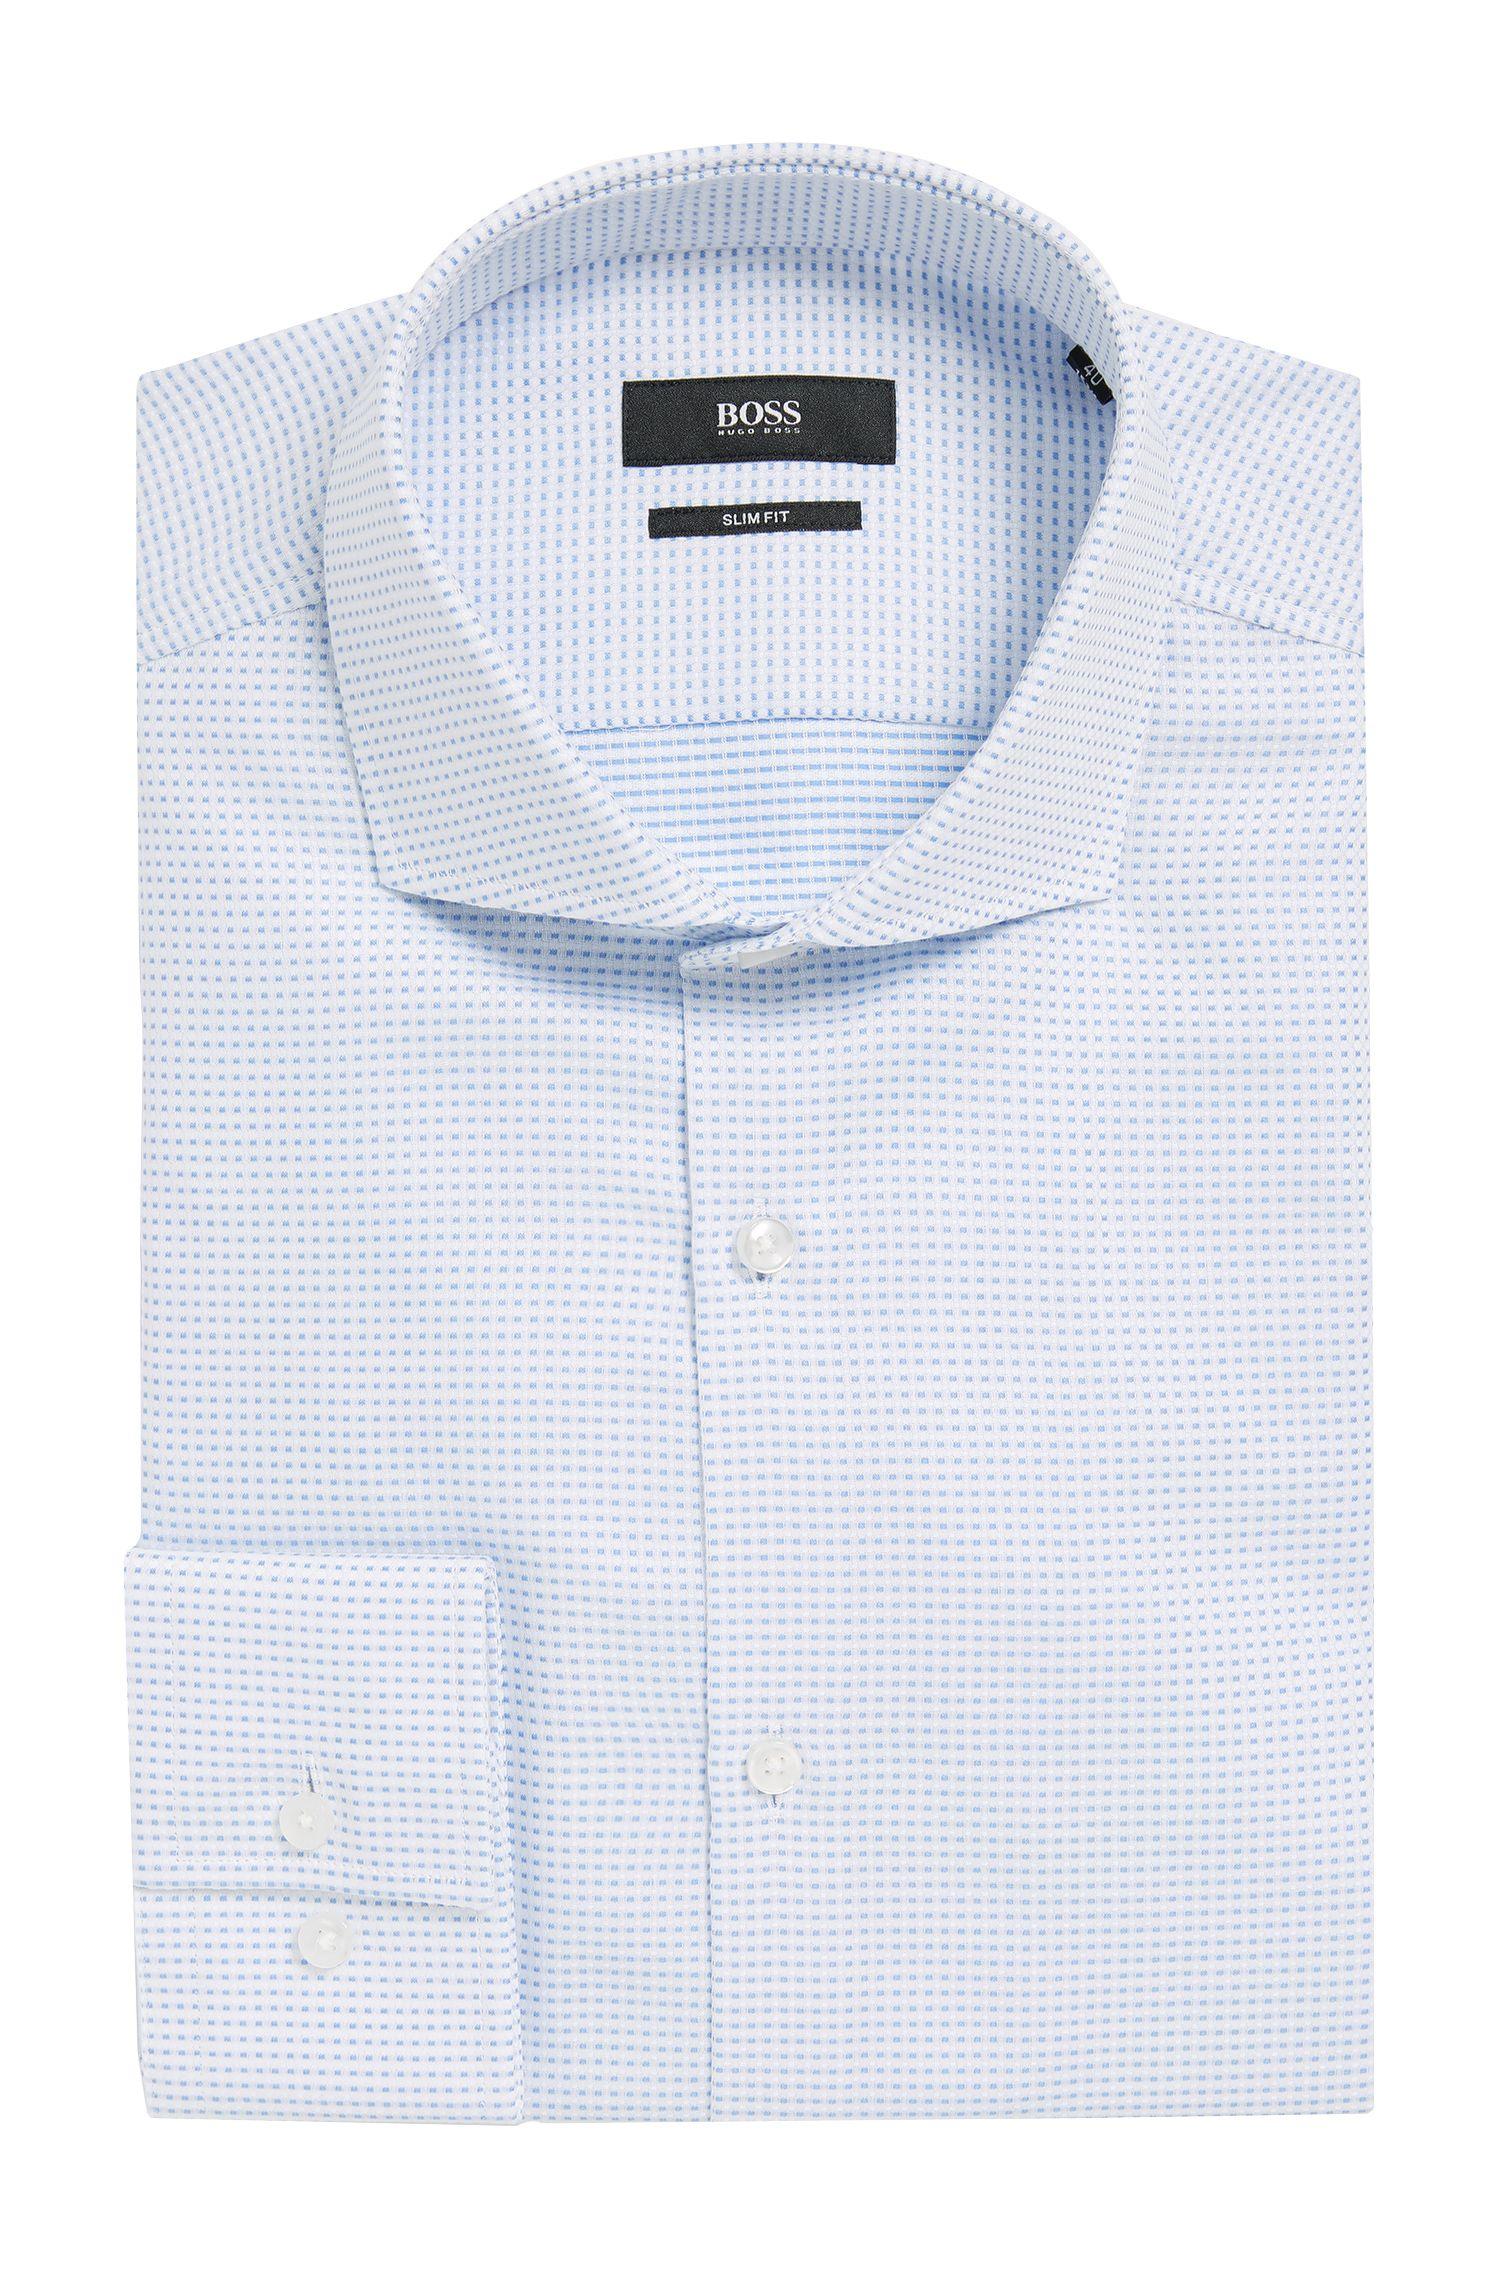 Patterned Cotton Dress Shirt, Slim Fit | Jason